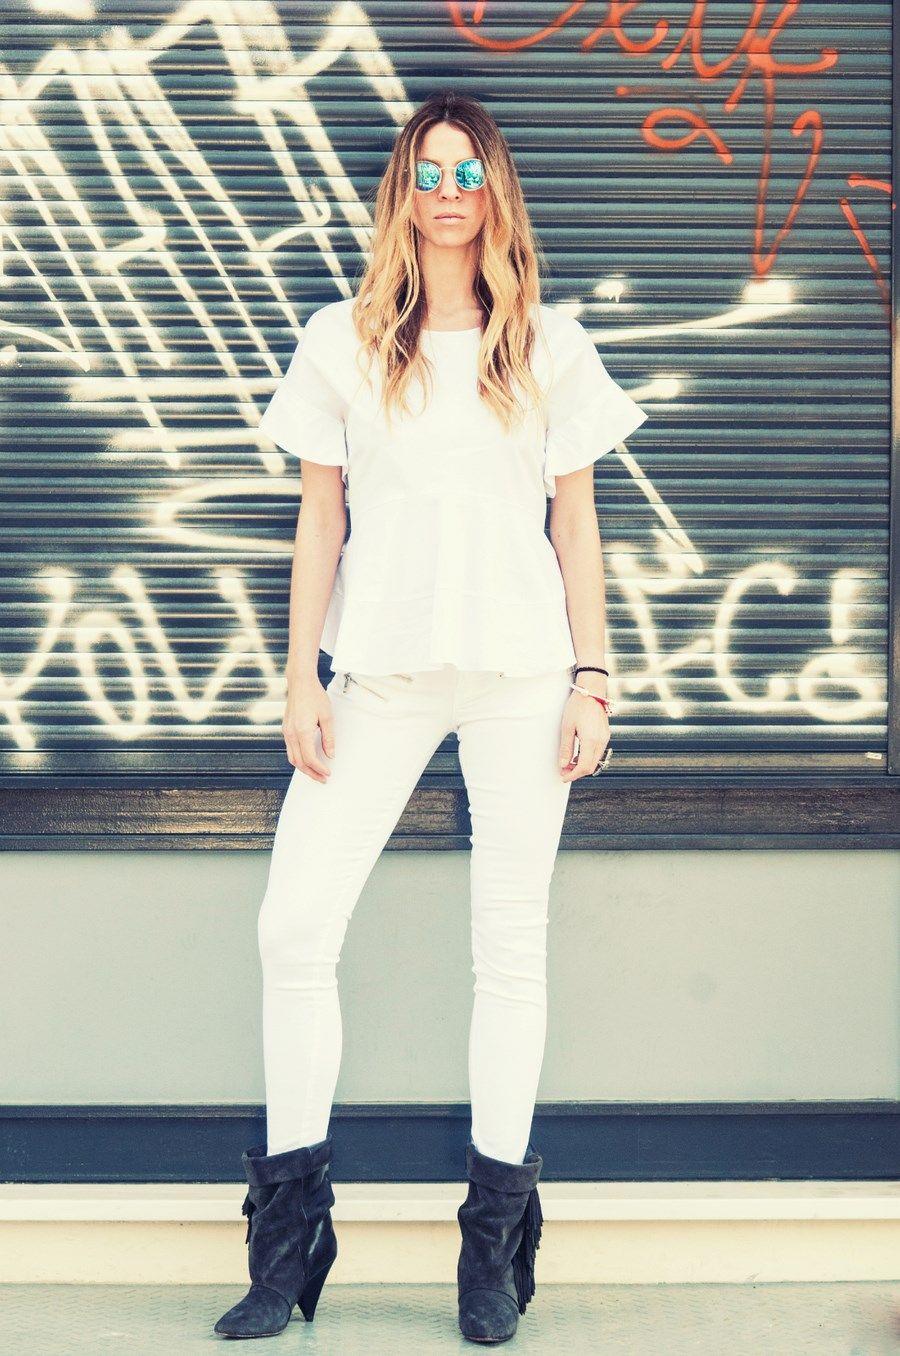 #whiteonwhite #grey #boots #isabelmarant #fringes #streetstyle #muserebelle #fashionblogger #ms